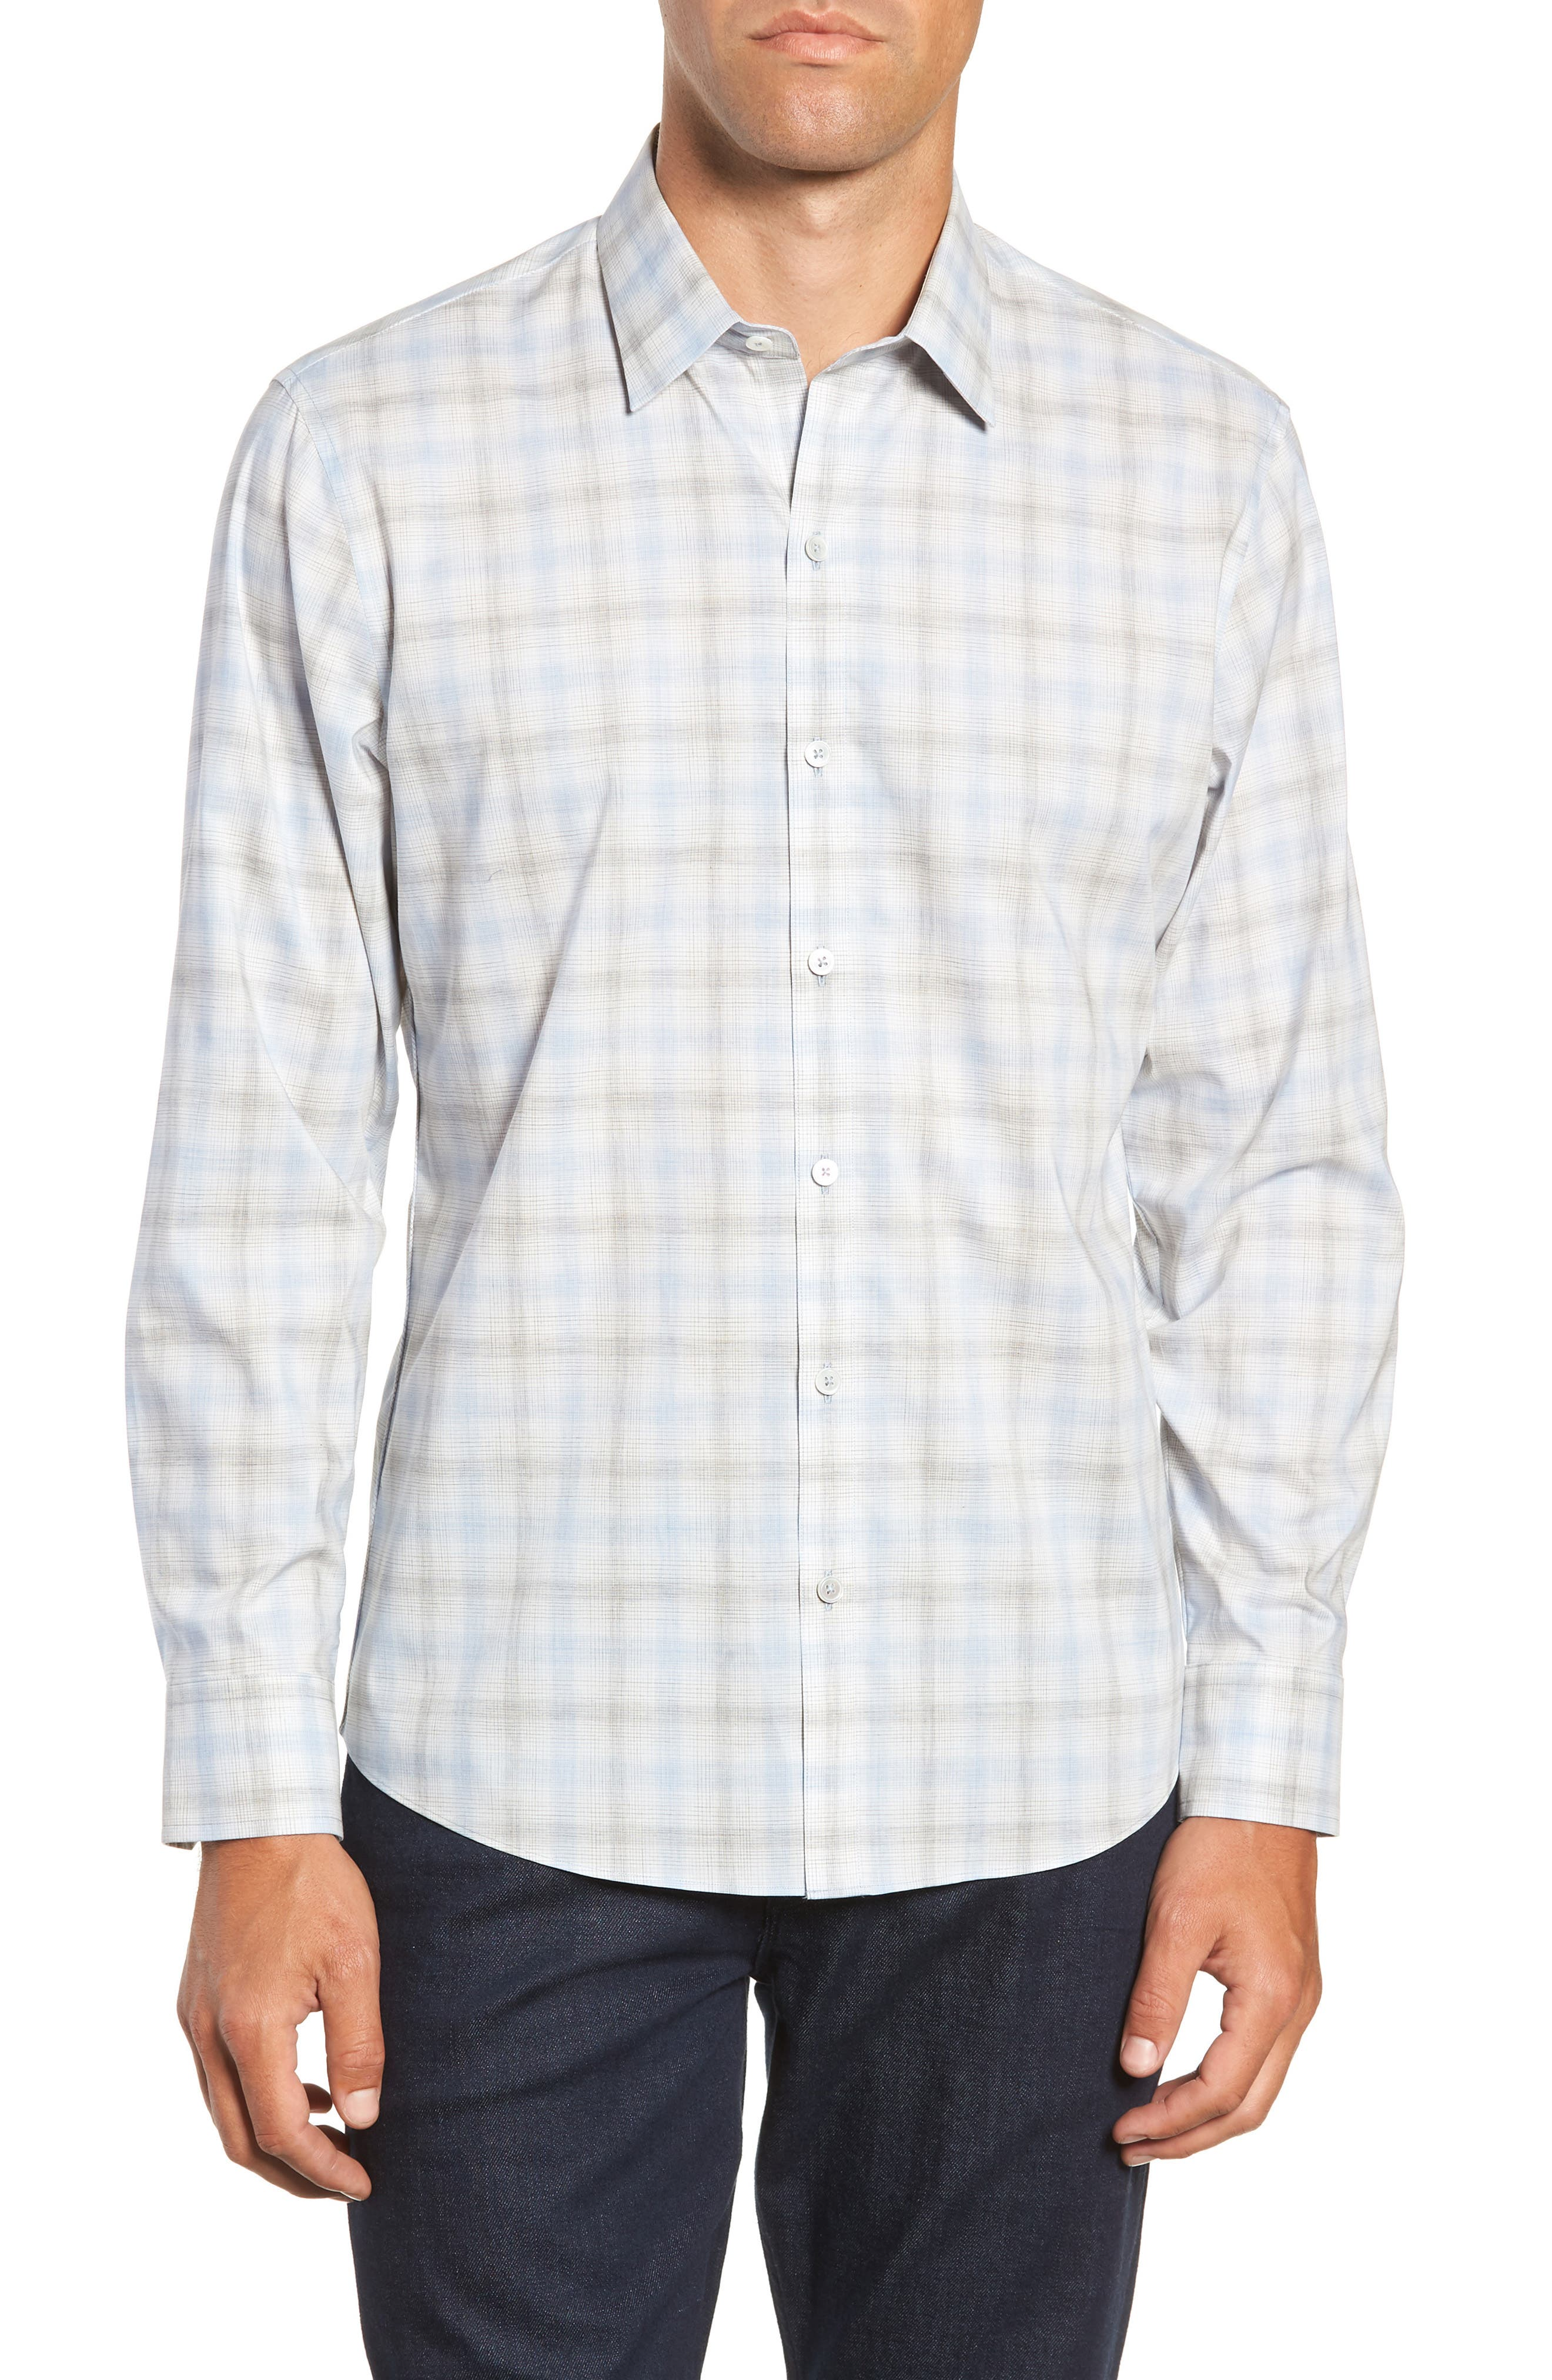 Mourad Regular Fit Sport Shirt,                             Main thumbnail 1, color,                             LIGHT GREY